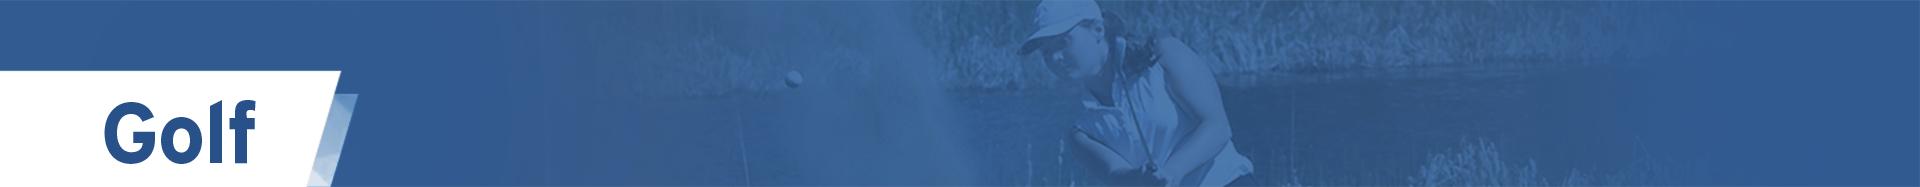 SDPB HS Golf Logo